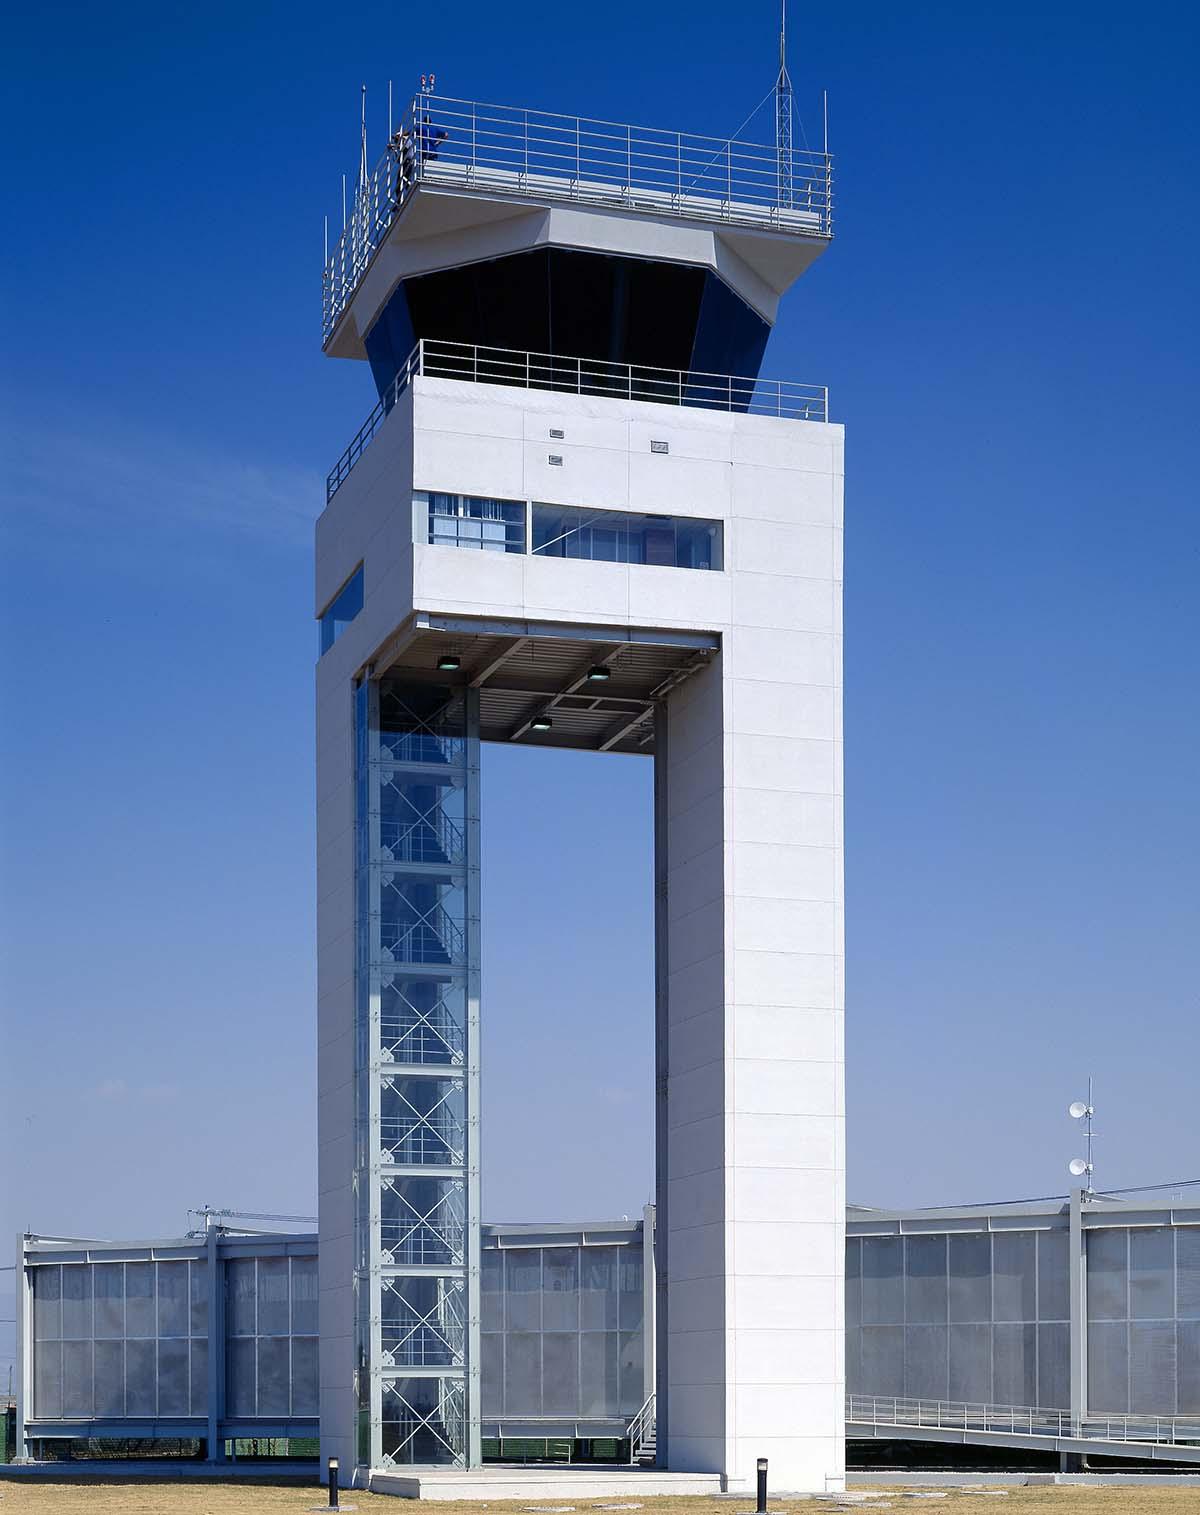 Torre de control Aeropuerto de Toluca